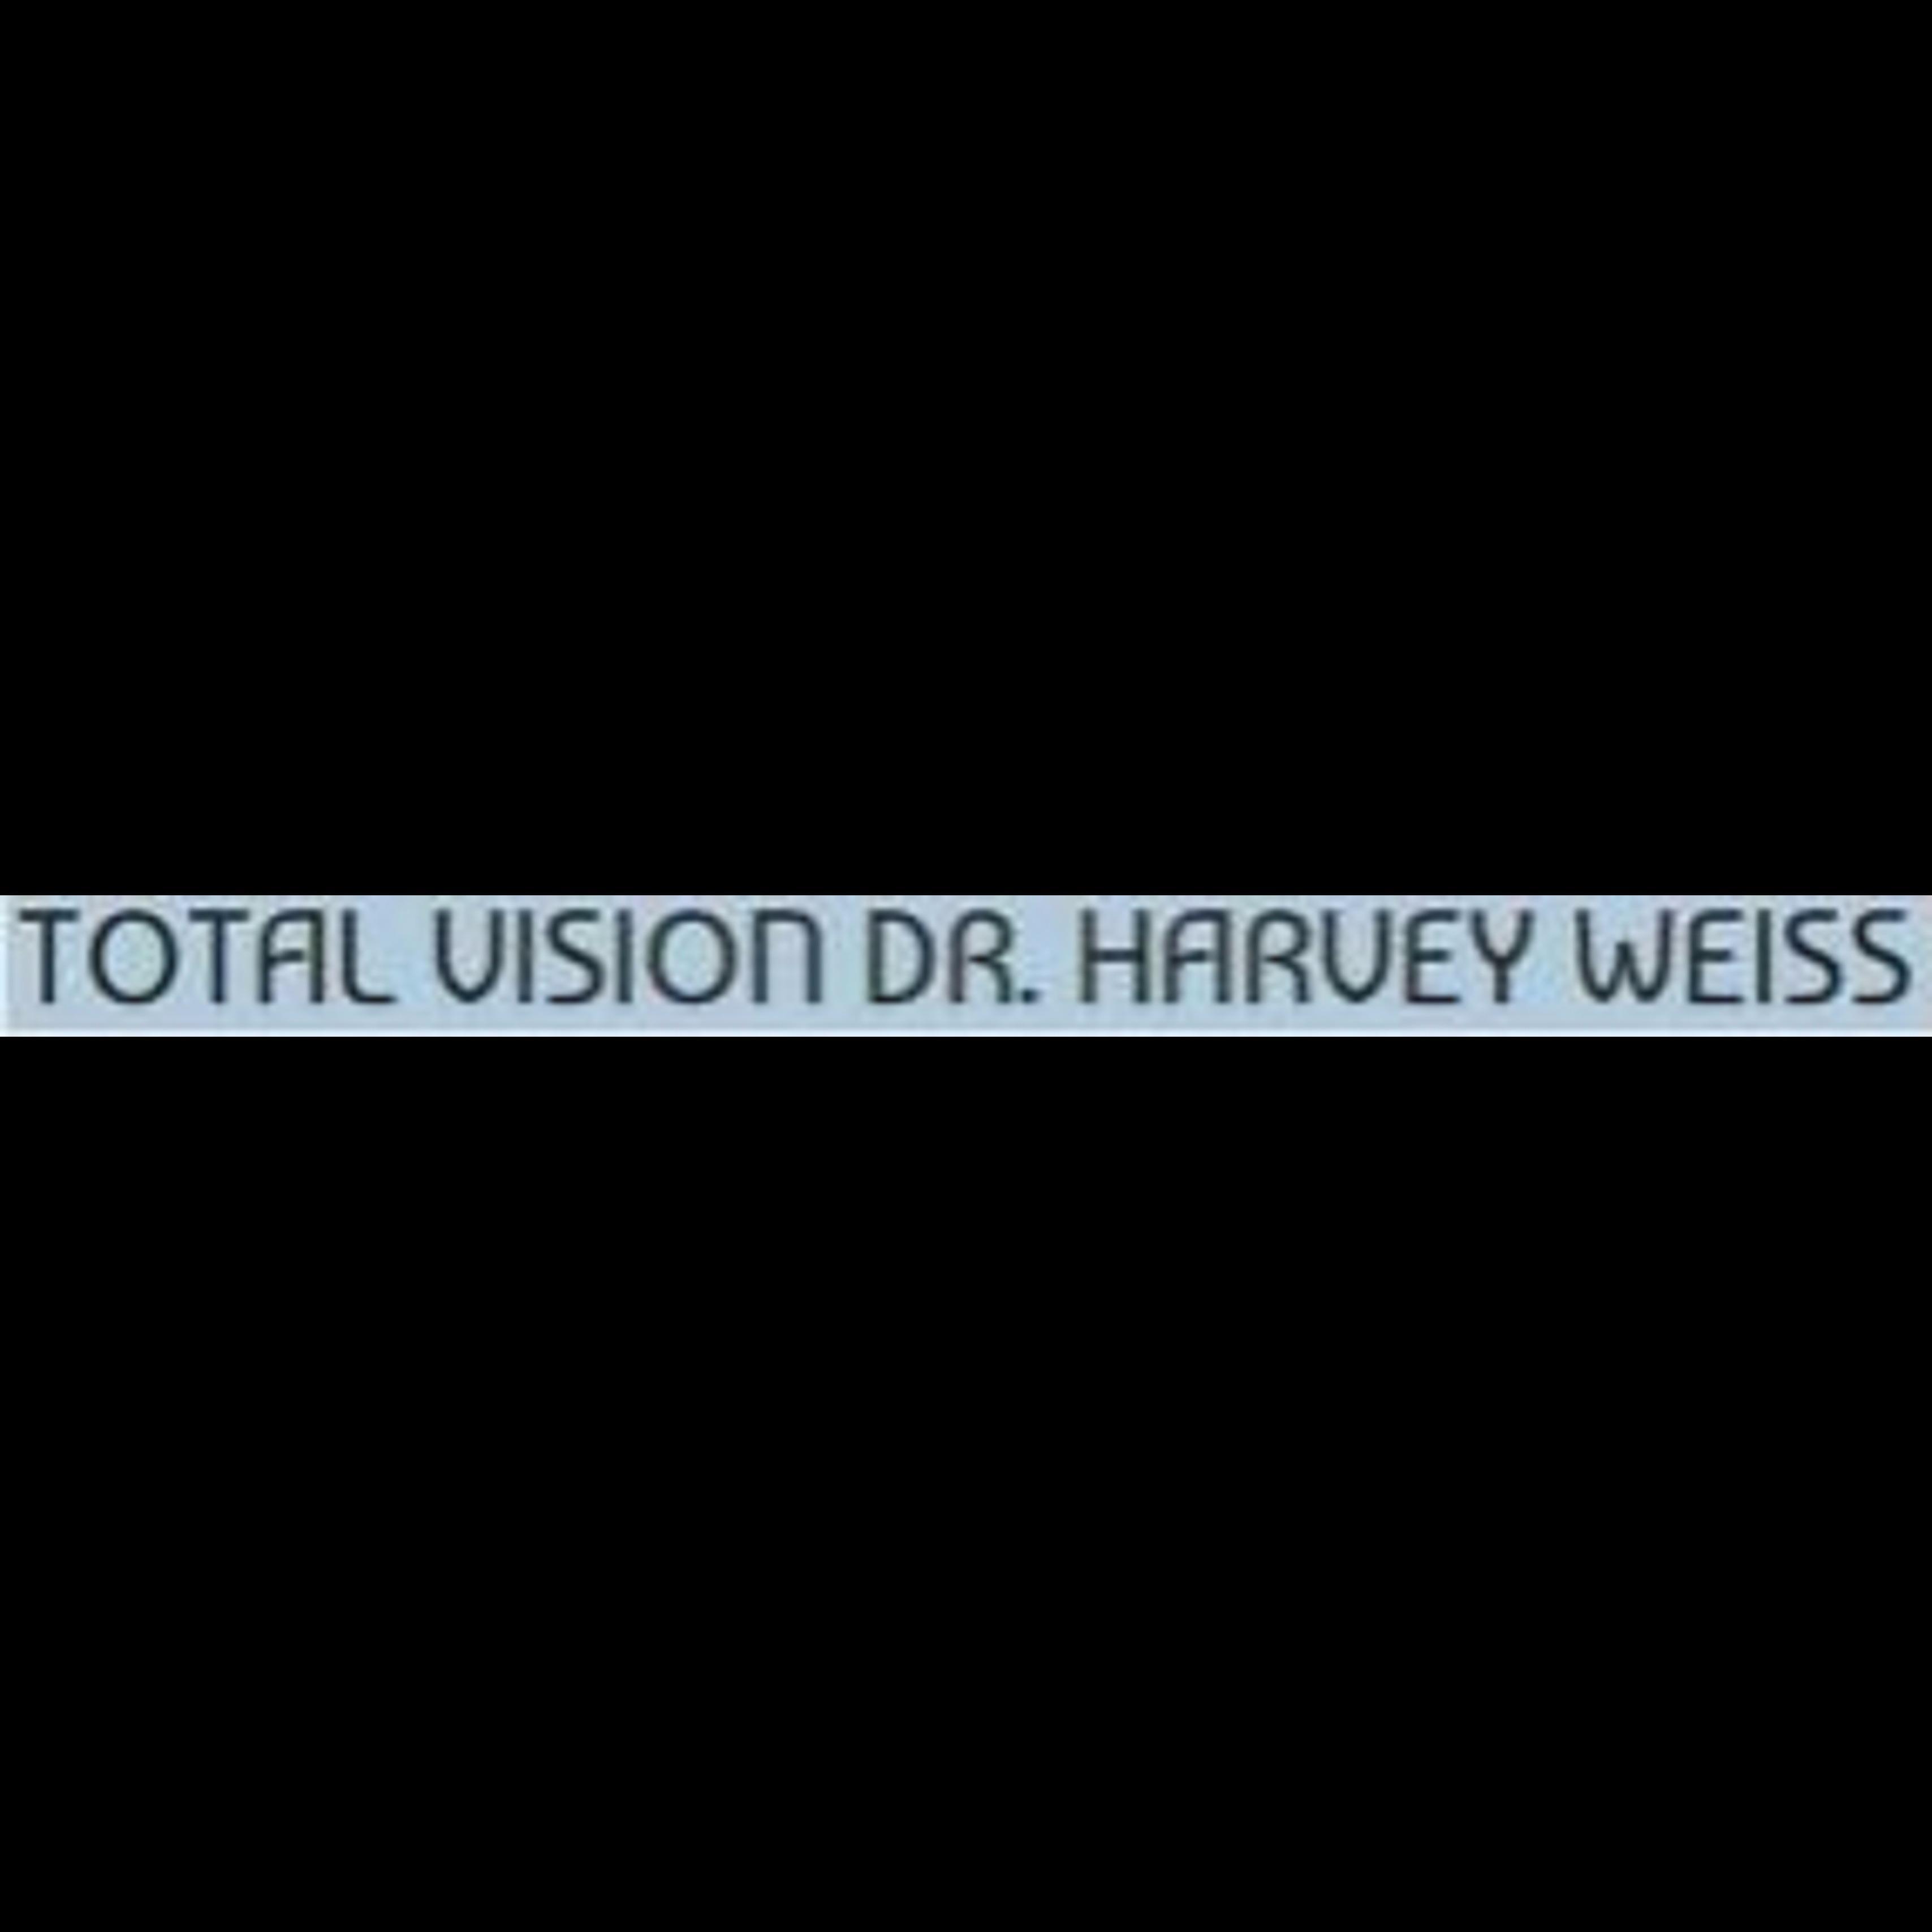 Harvey F. Weiss Optometrist